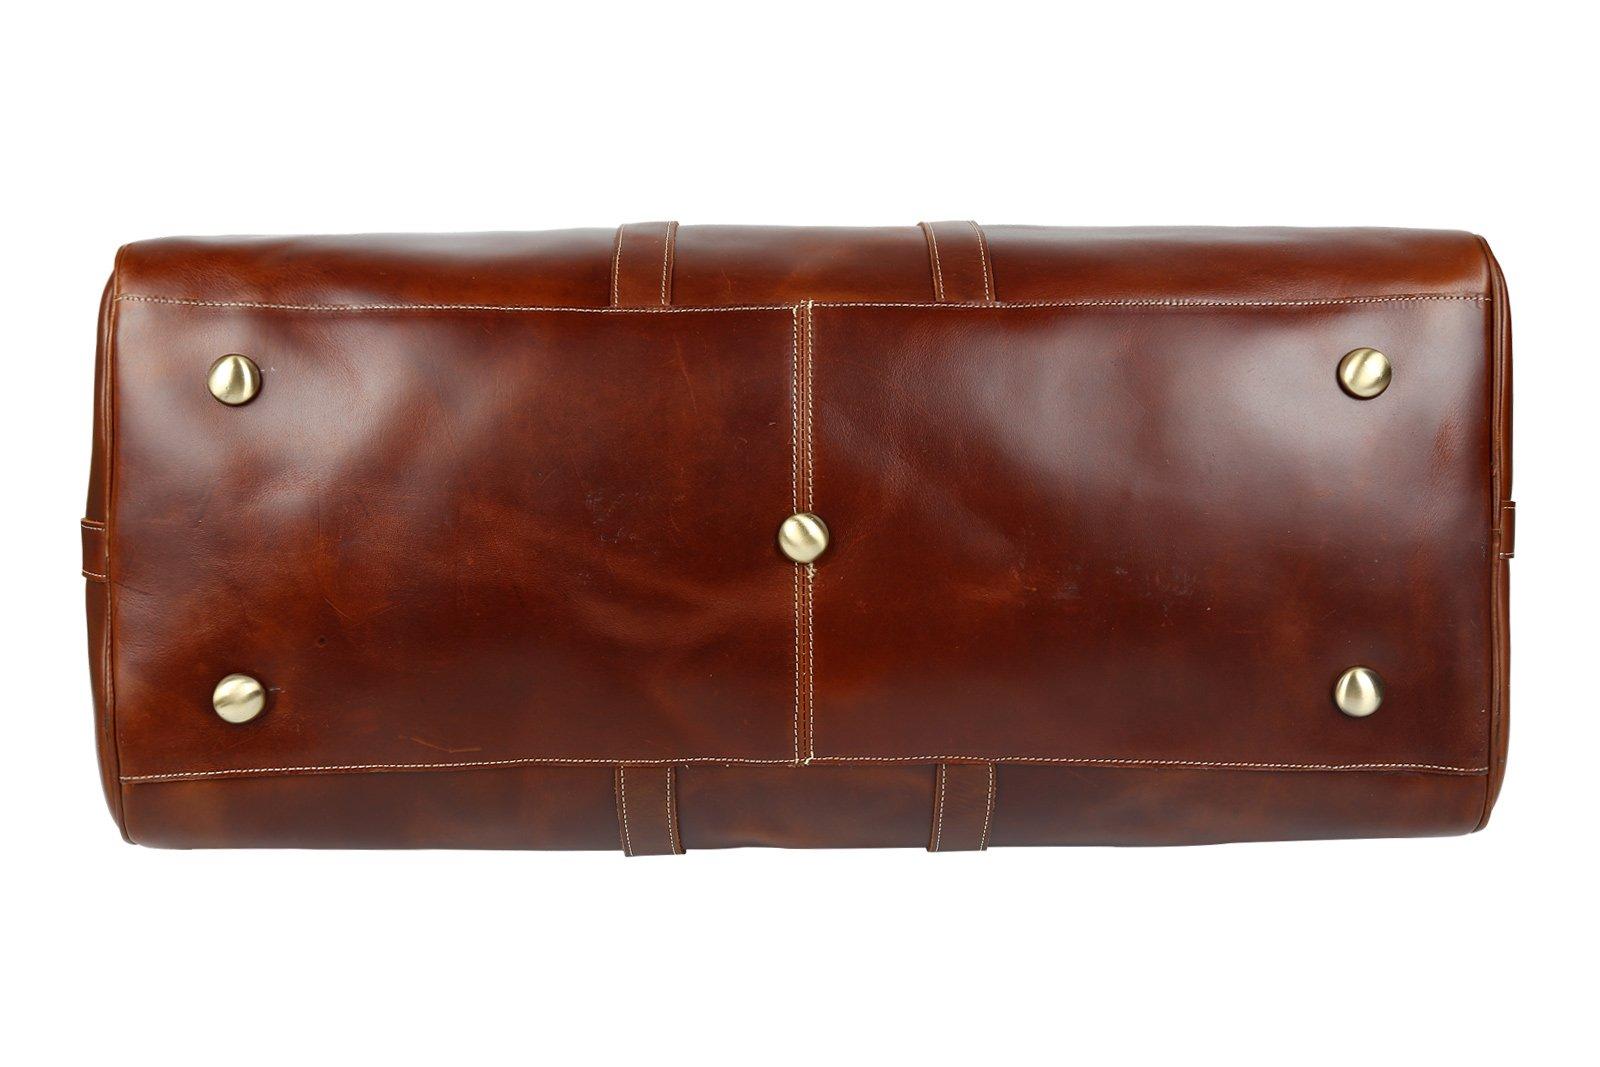 Huntvp Mens Leather Travel Duffel Bag Vintage Weekender Carry On Brown Luggage Bag by Huntvp (Image #5)